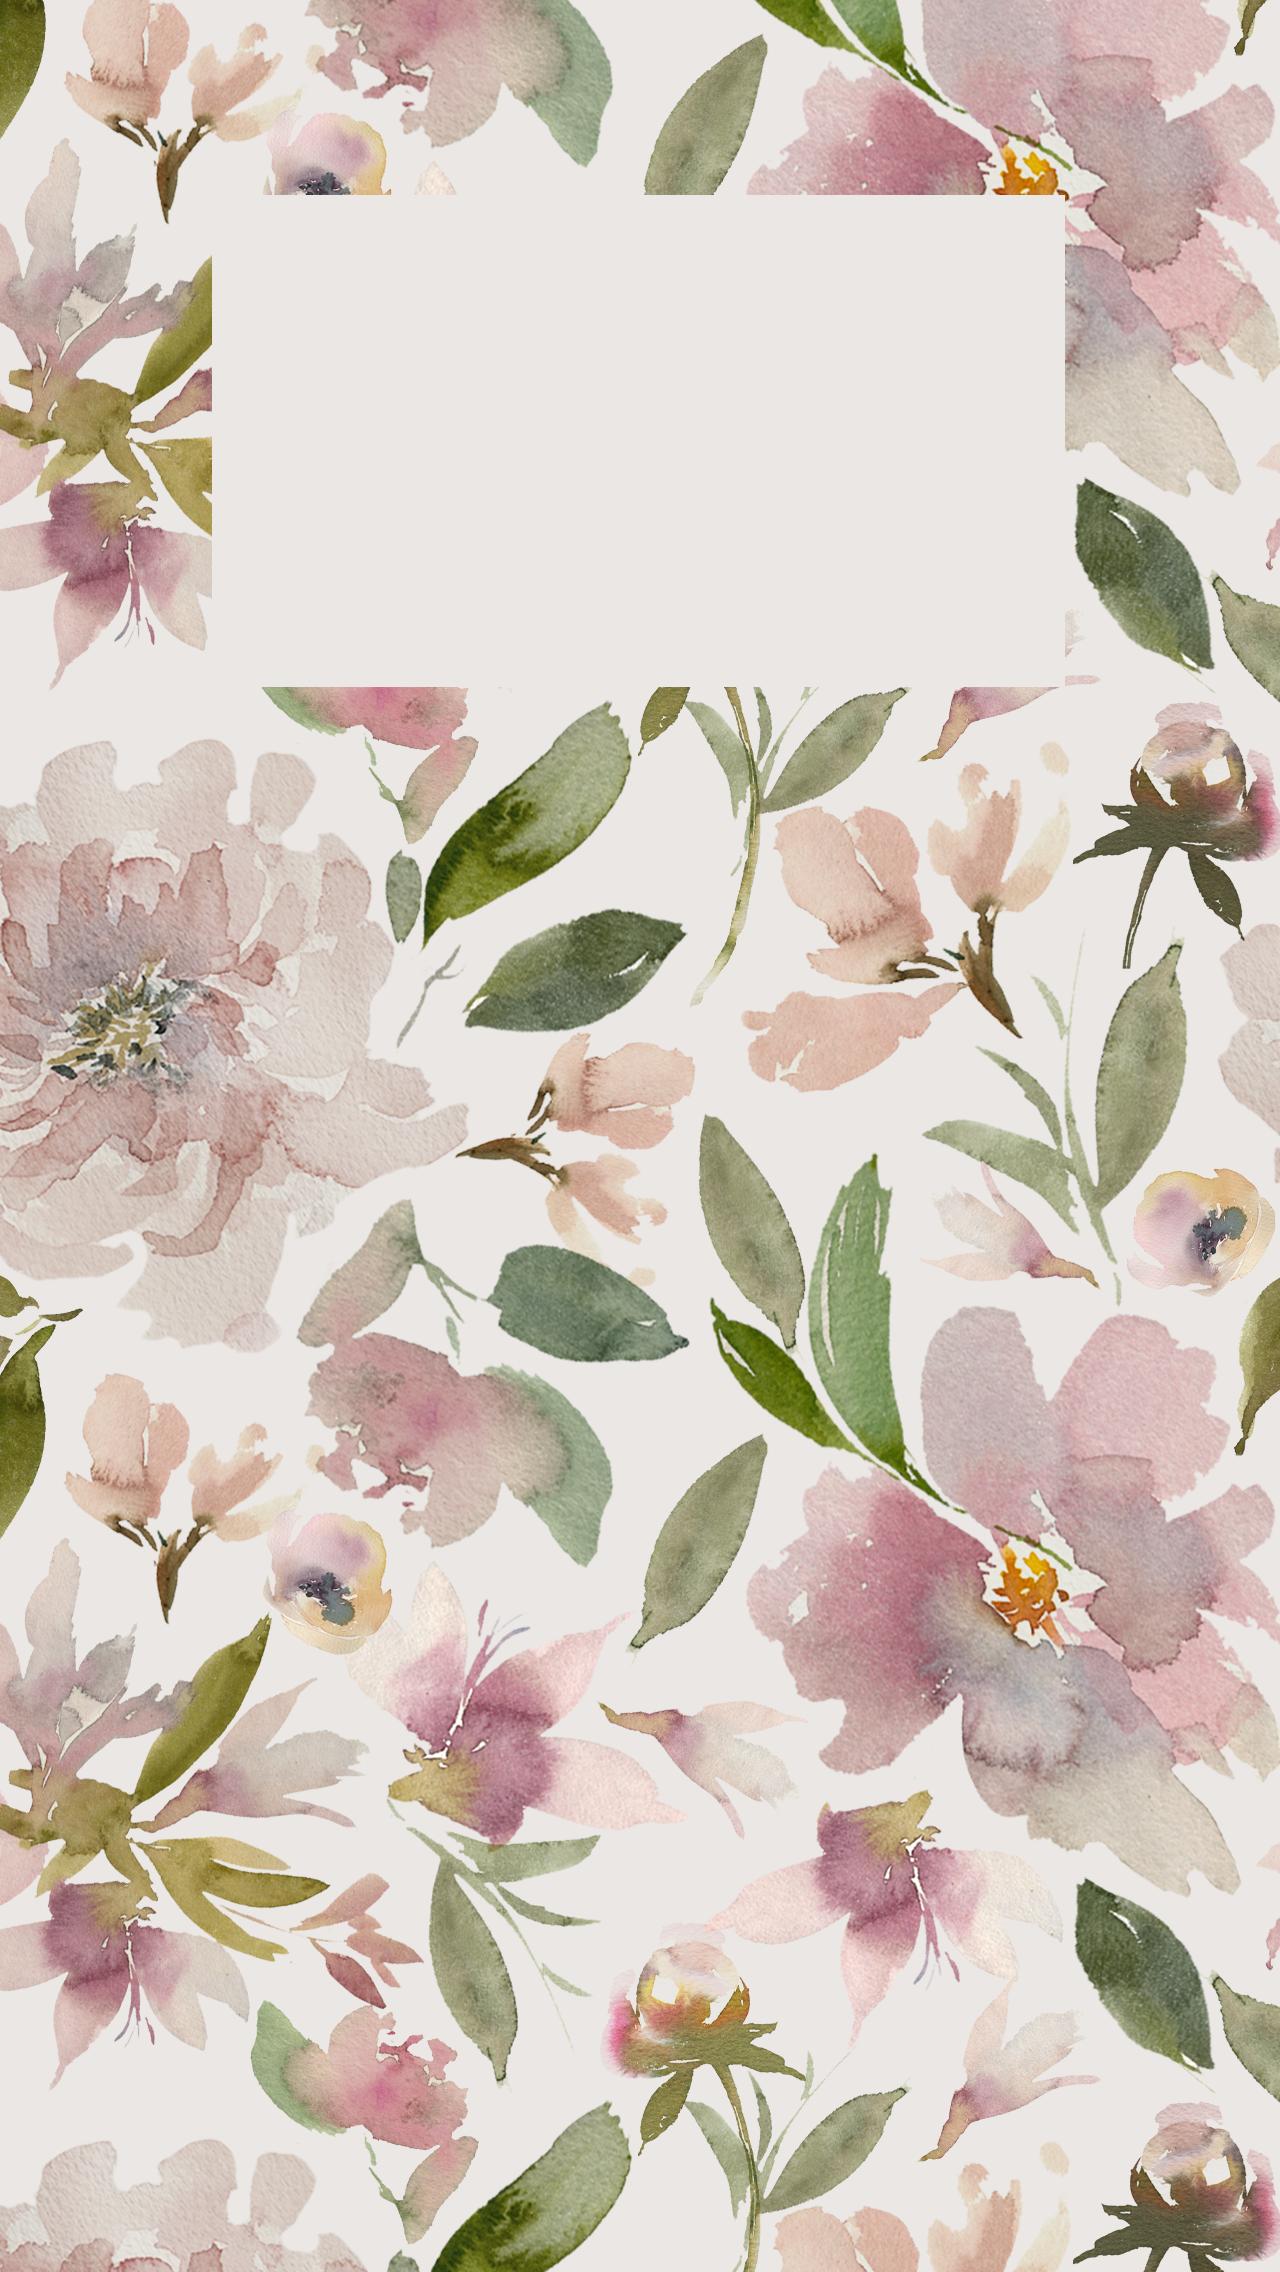 Pattern Free Ipad Wallpaper Free Iphone Wallpaper Floral Flowers Illustration Floral Wallpaper Iphone Free Ipad Wallpaper Pattern Wallpaper